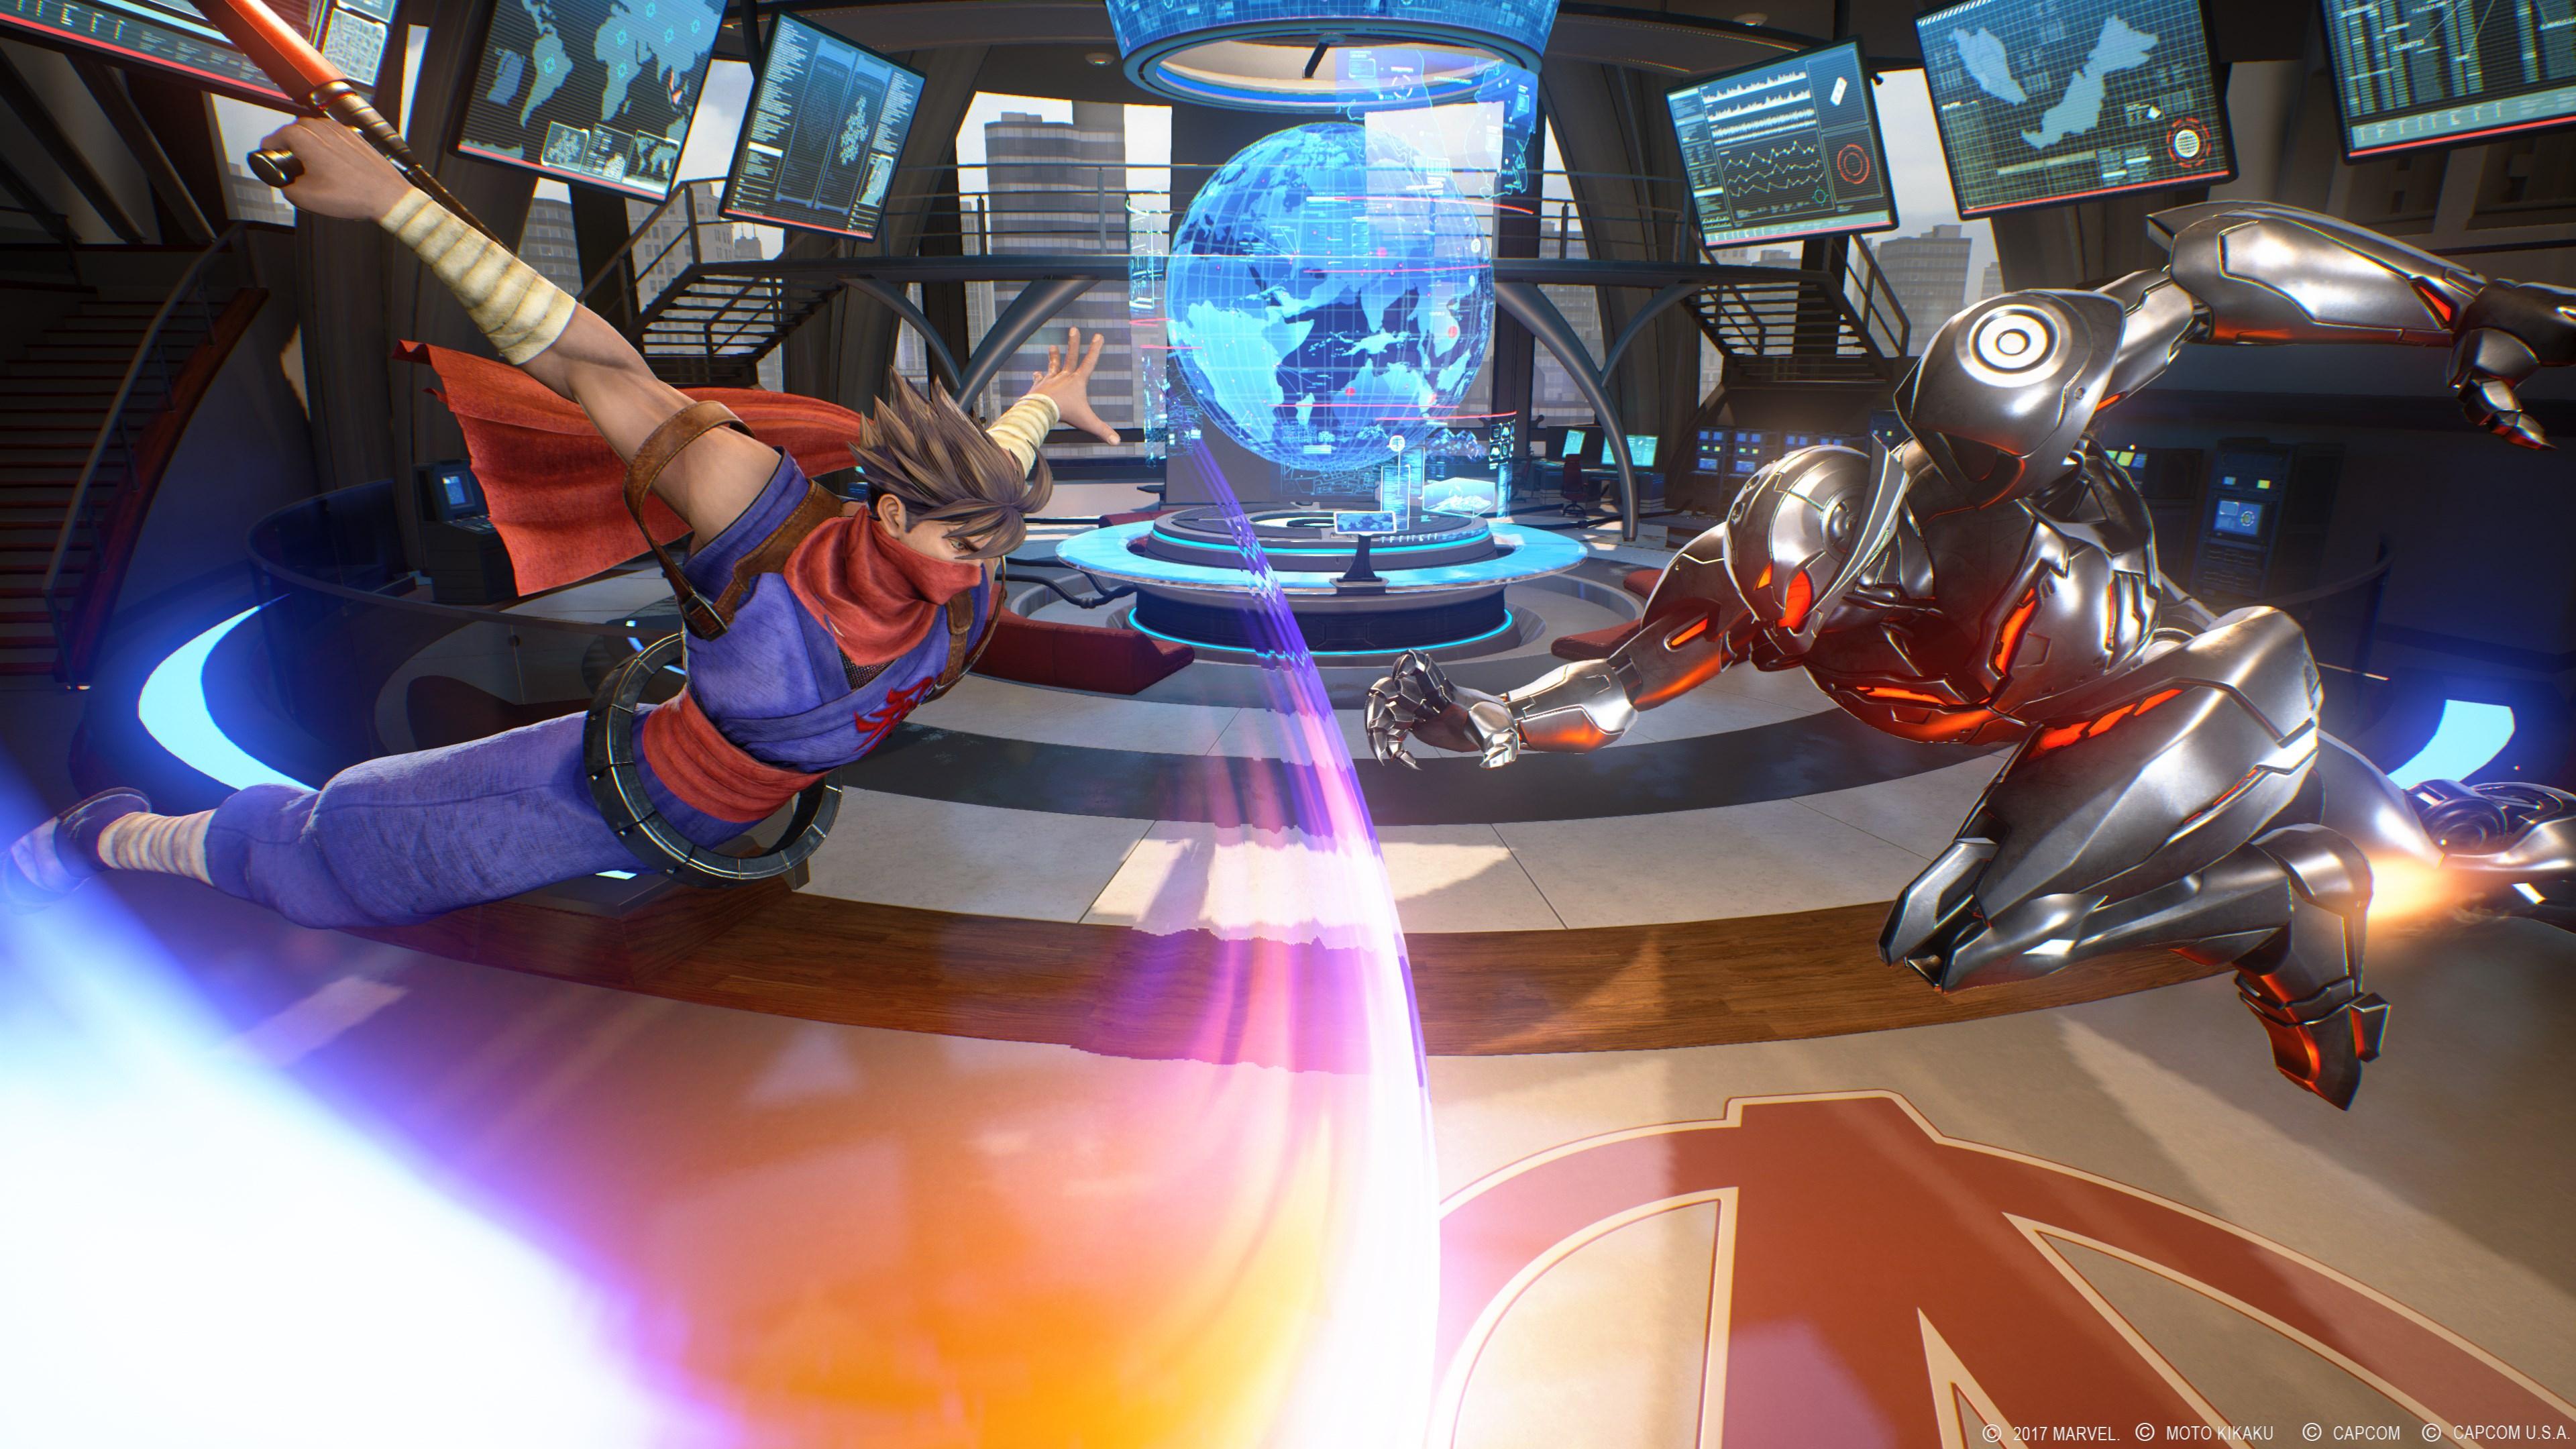 http://www.akibagamers.it/wp-content/uploads/2017/04/marvel-vs-capcom-infinite-screenshot-07.jpg